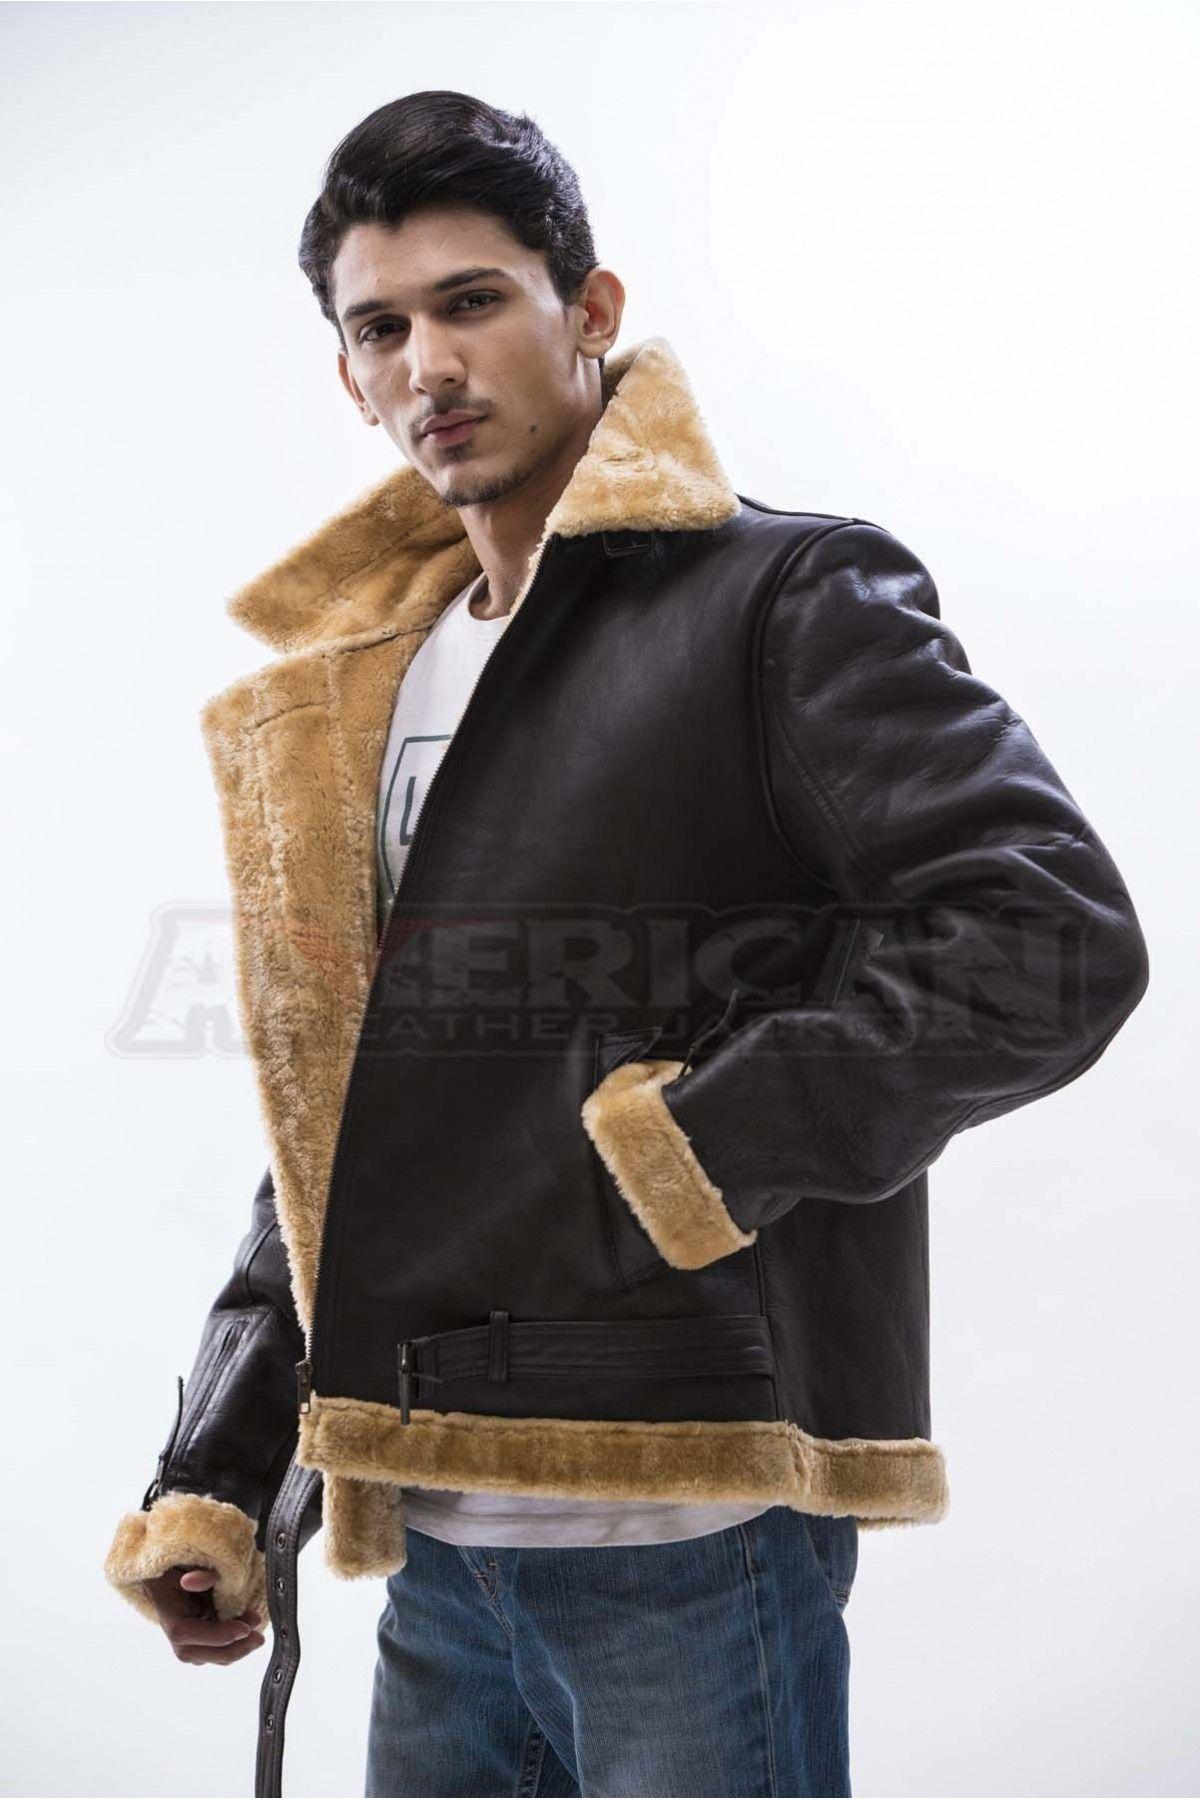 Tom Hardy Dunkirk Farrier Leather Jacket Mens Fashion Coat Leather Jacket Tom Hardy Dunkirk [ 1800 x 1200 Pixel ]